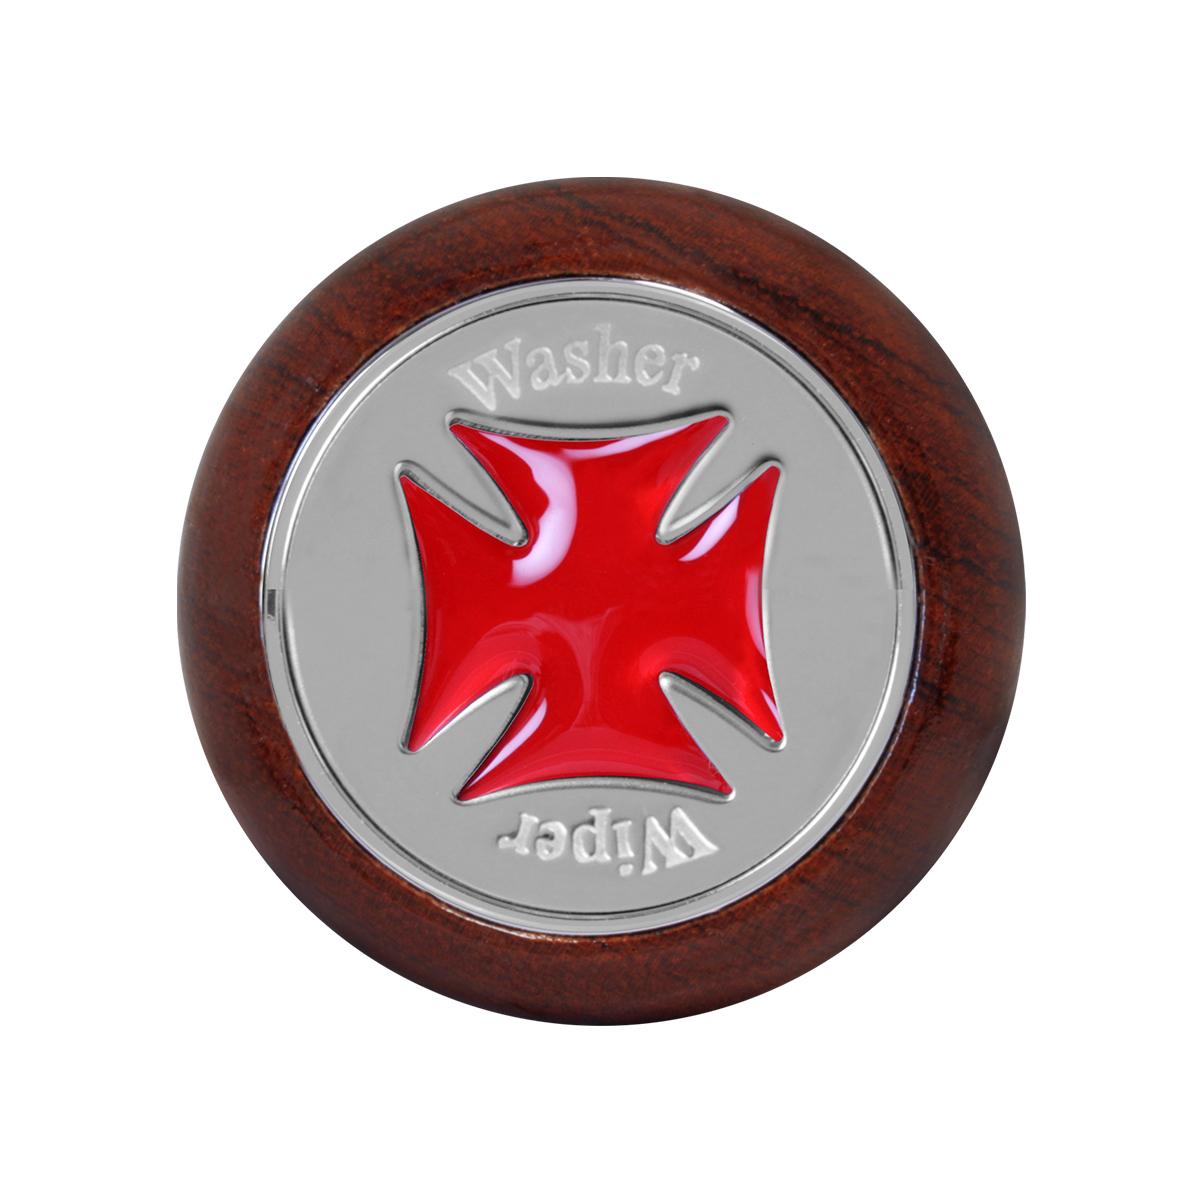 95445 Red Iron Cross Dashboard Control Knob w/ Wiper/Washer Script